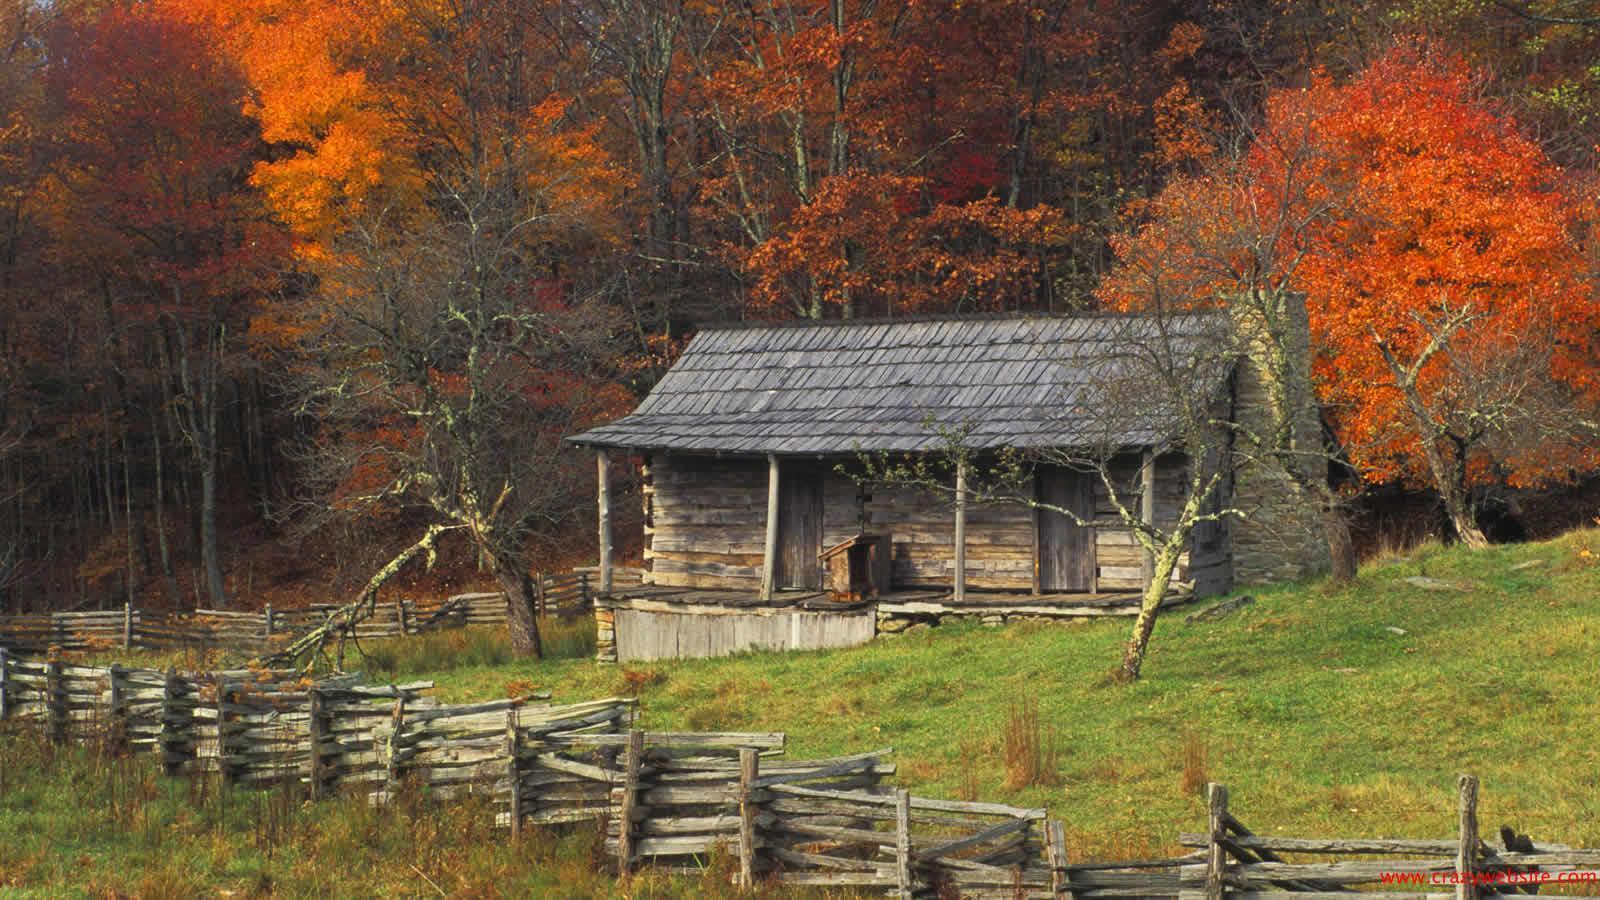 old cabin winter scene wallpaper - photo #27